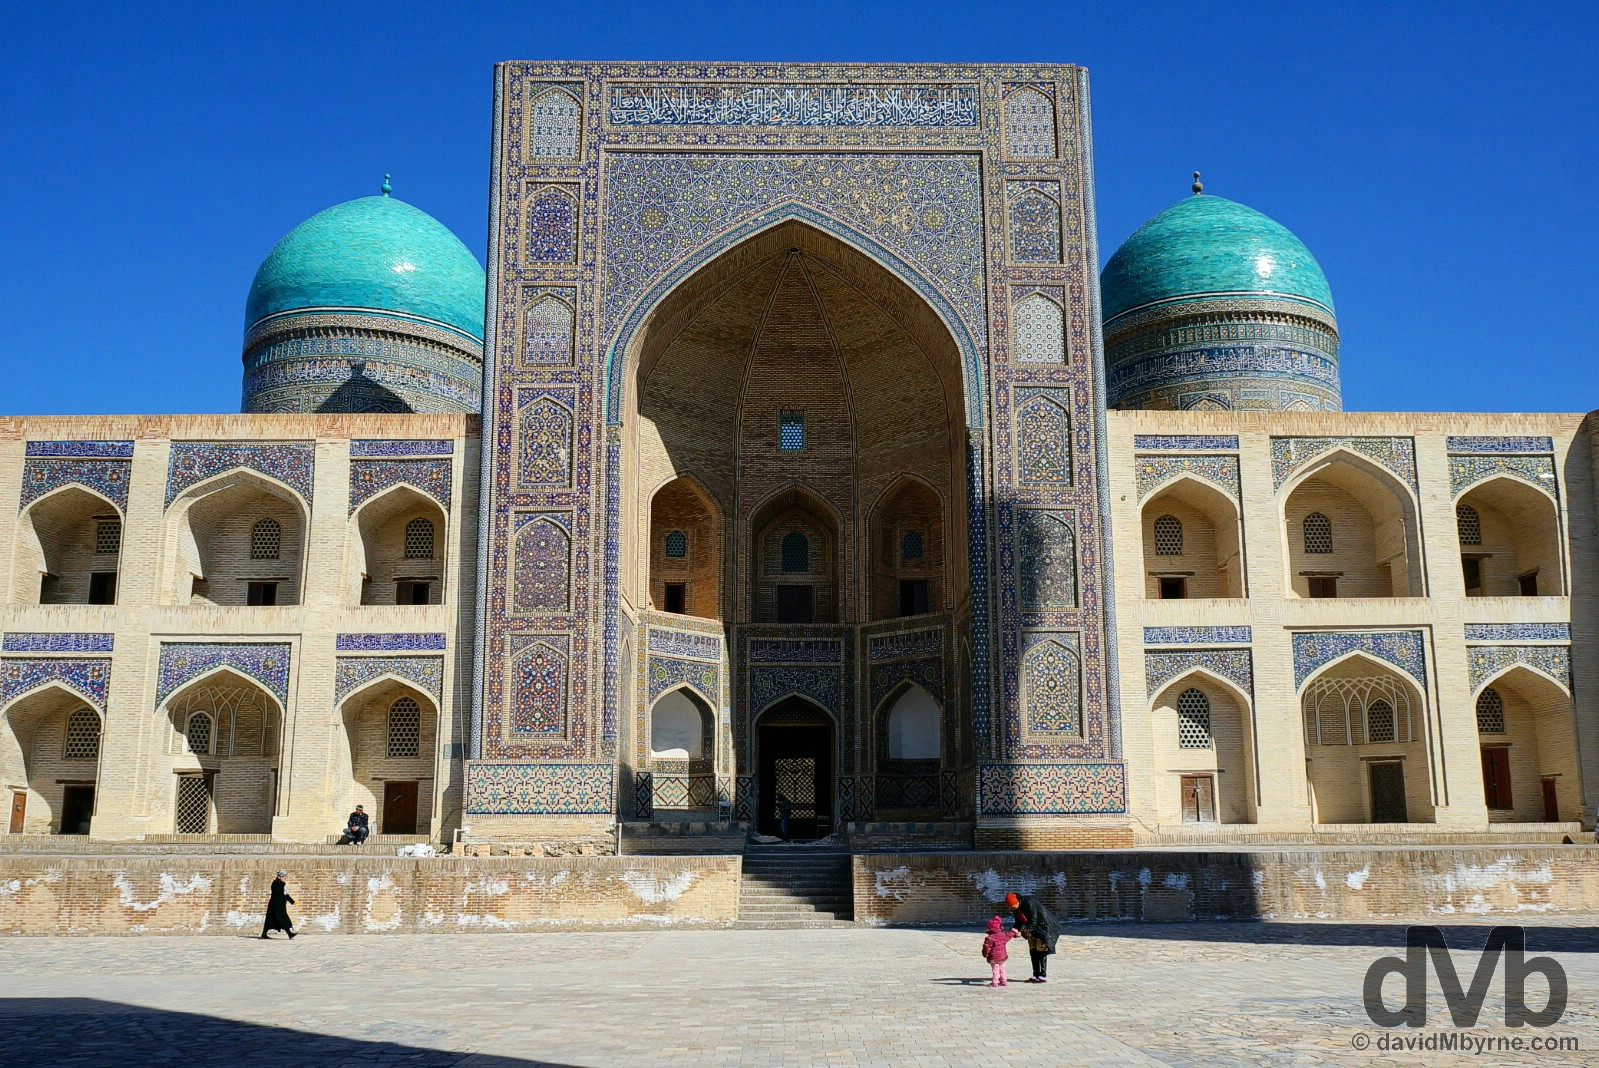 Mir-i-Arab Medressa, Bukhara, Uzbekistan. March 12, 2015.